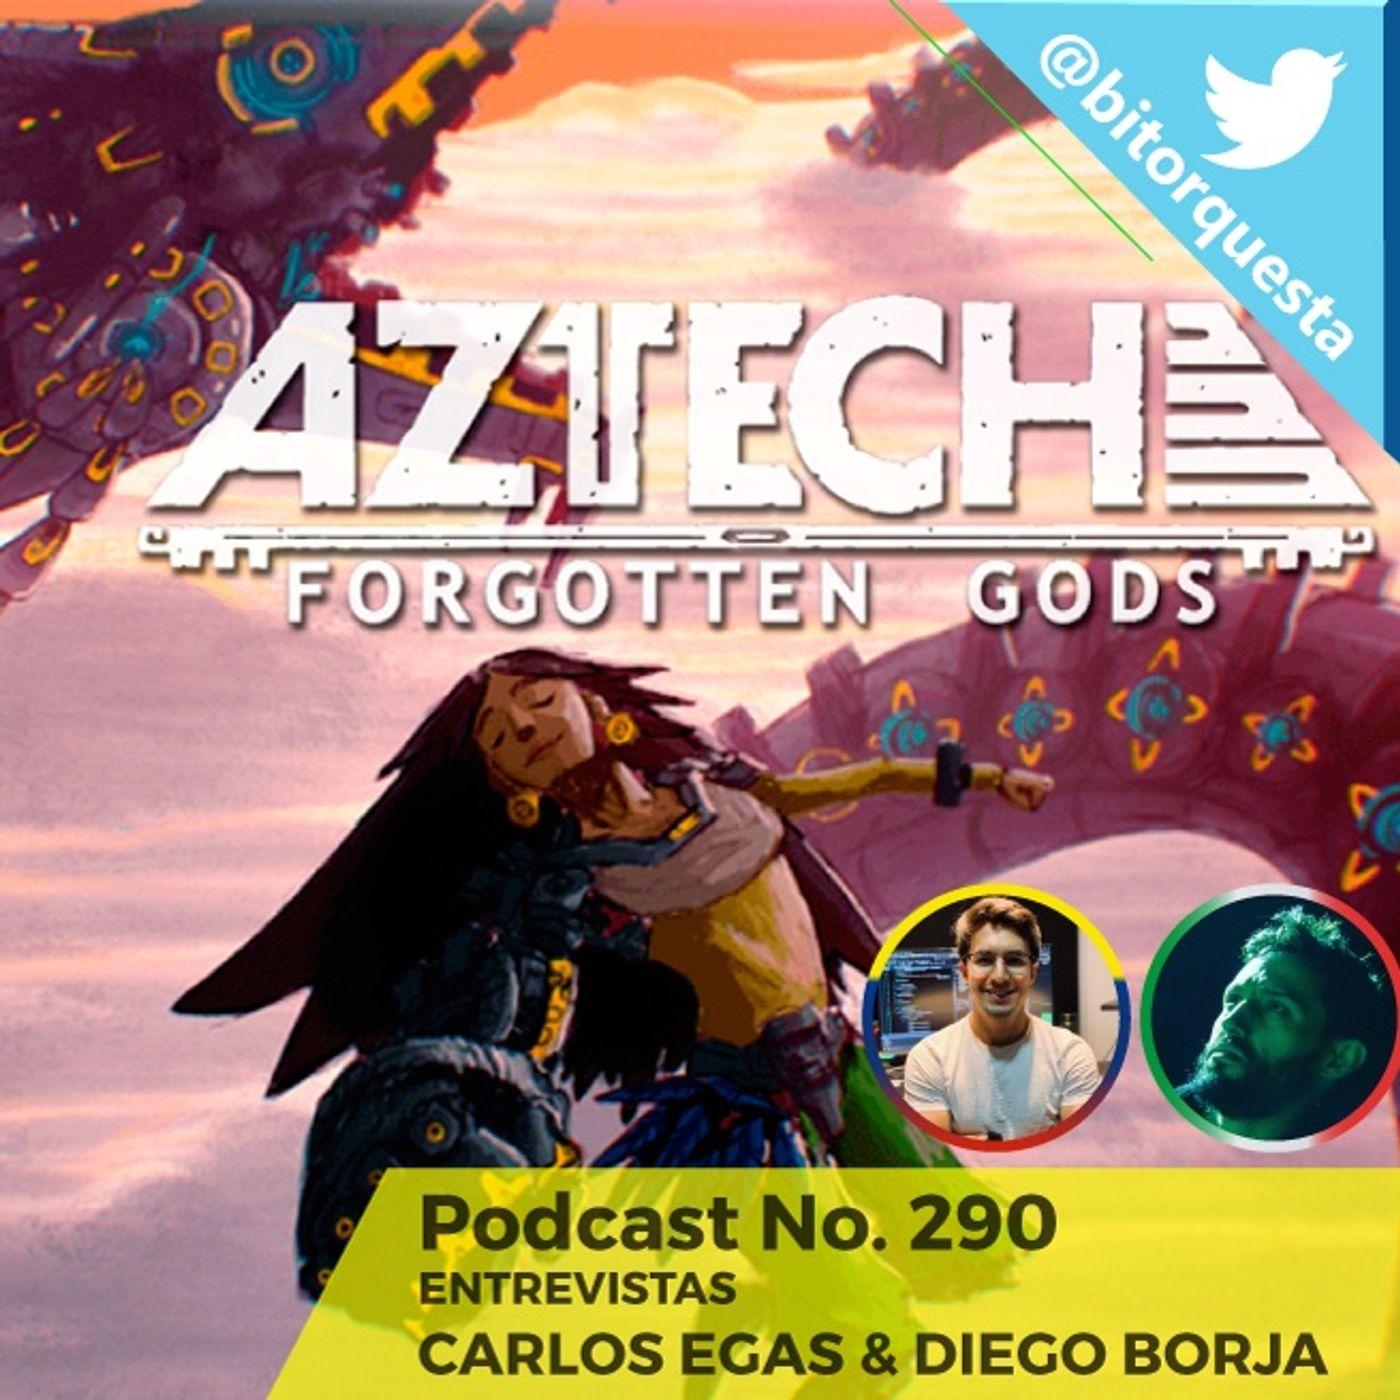 290 - Entrevista Carlos Egas & Diego Borja, Aztech Forgotten Gods, Lienzo Estudio Mx.